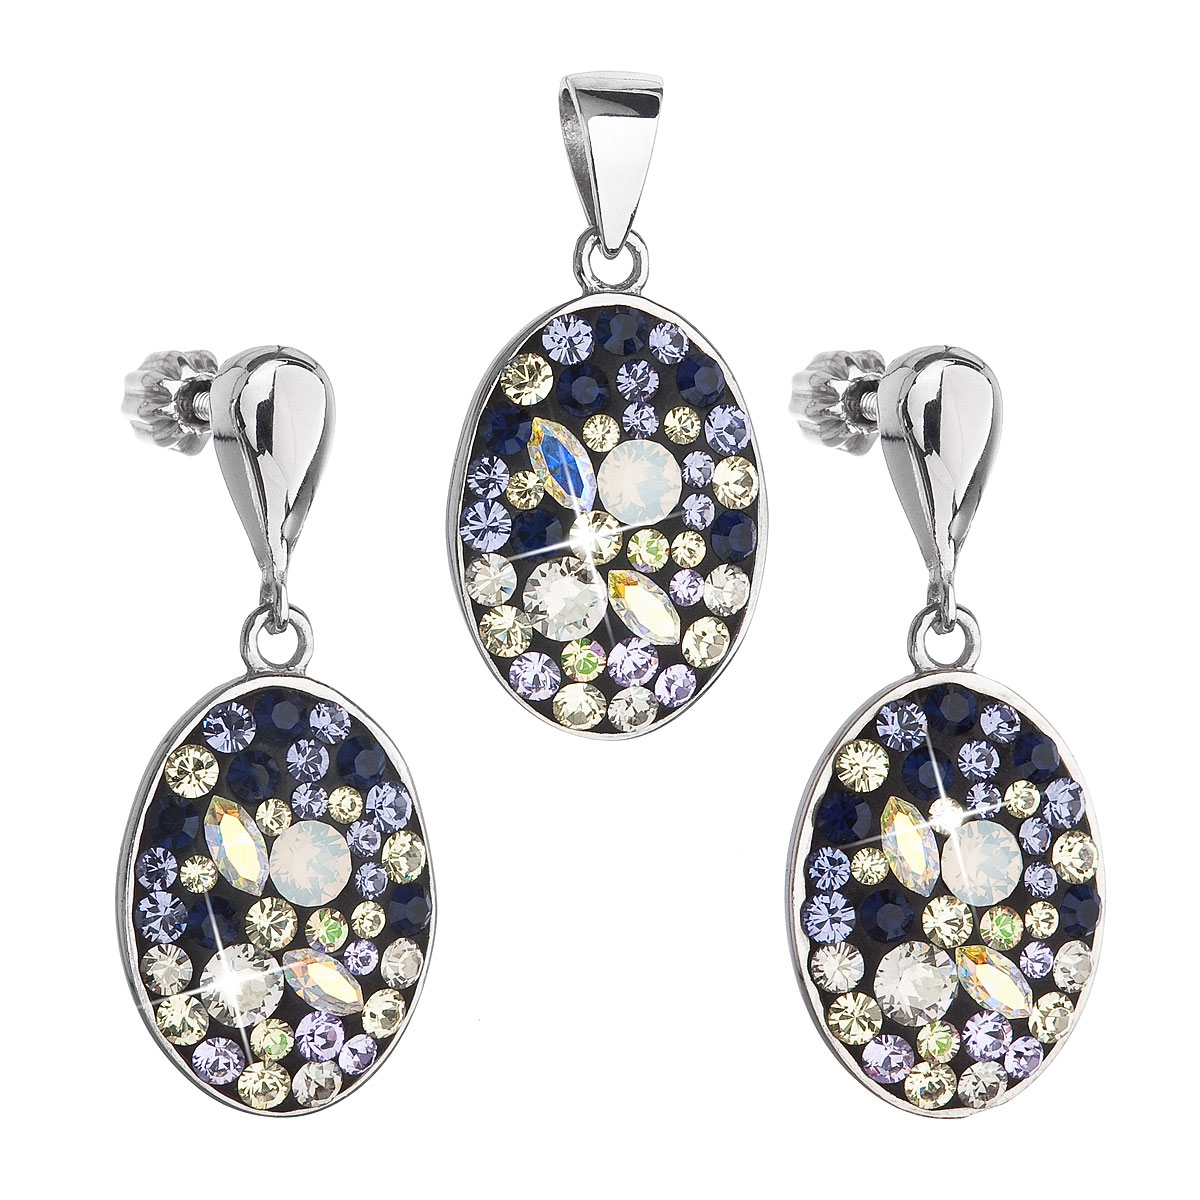 Sada stříbrných šperků oválky s kamínky Crystals from Swarovski®